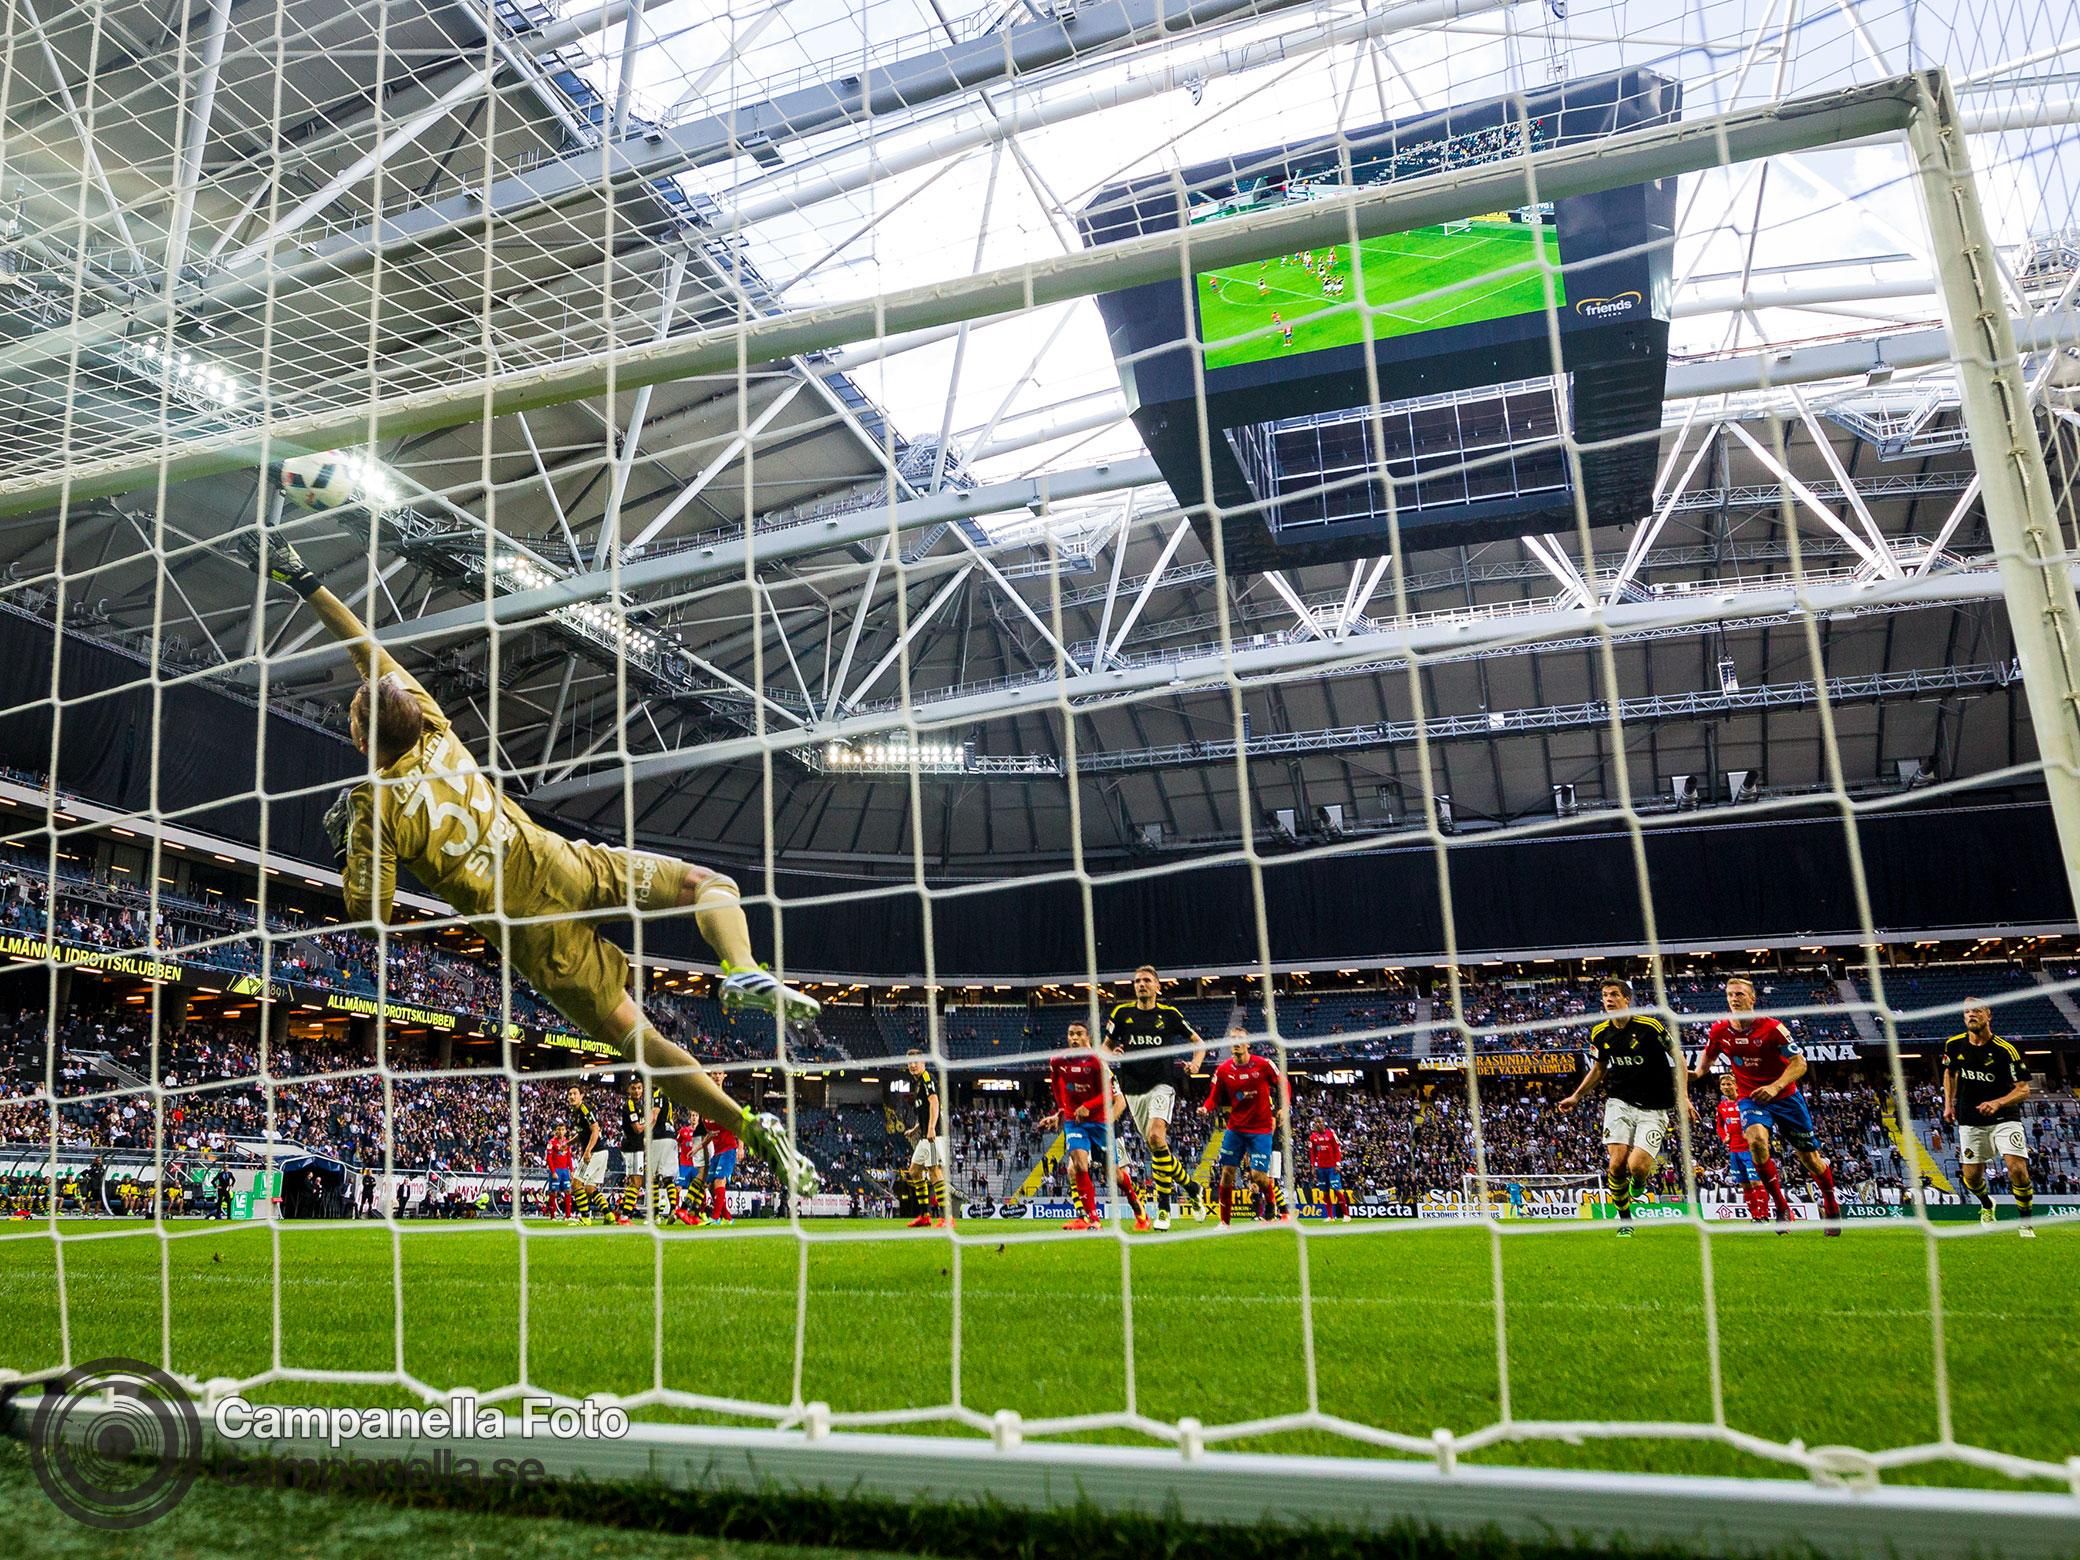 AIK comeback to win against Helsingborg - Michael Campanella Photography